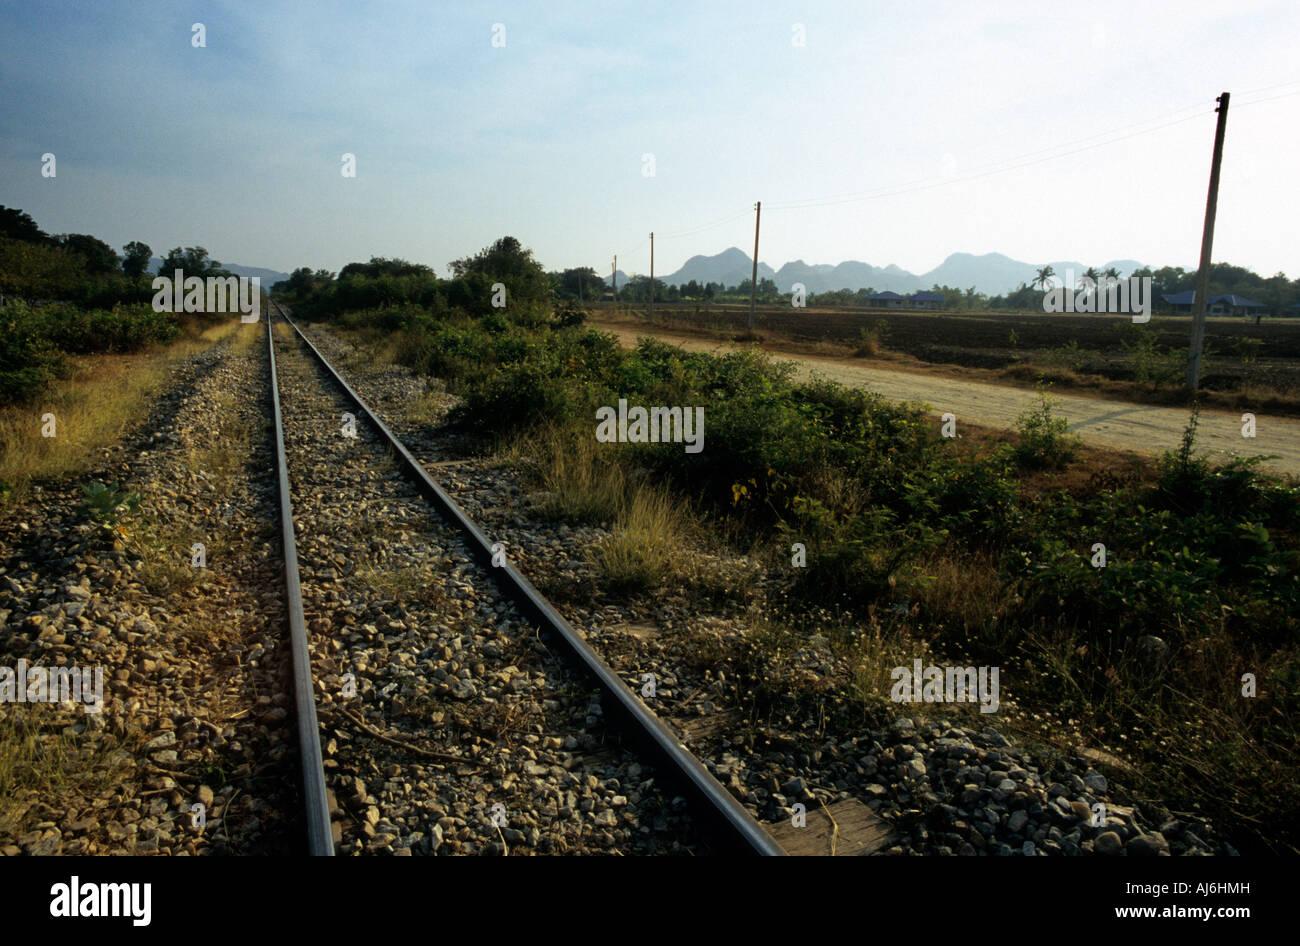 The Thailand to Burma railway near Chungkai, Thailand. - Stock Image